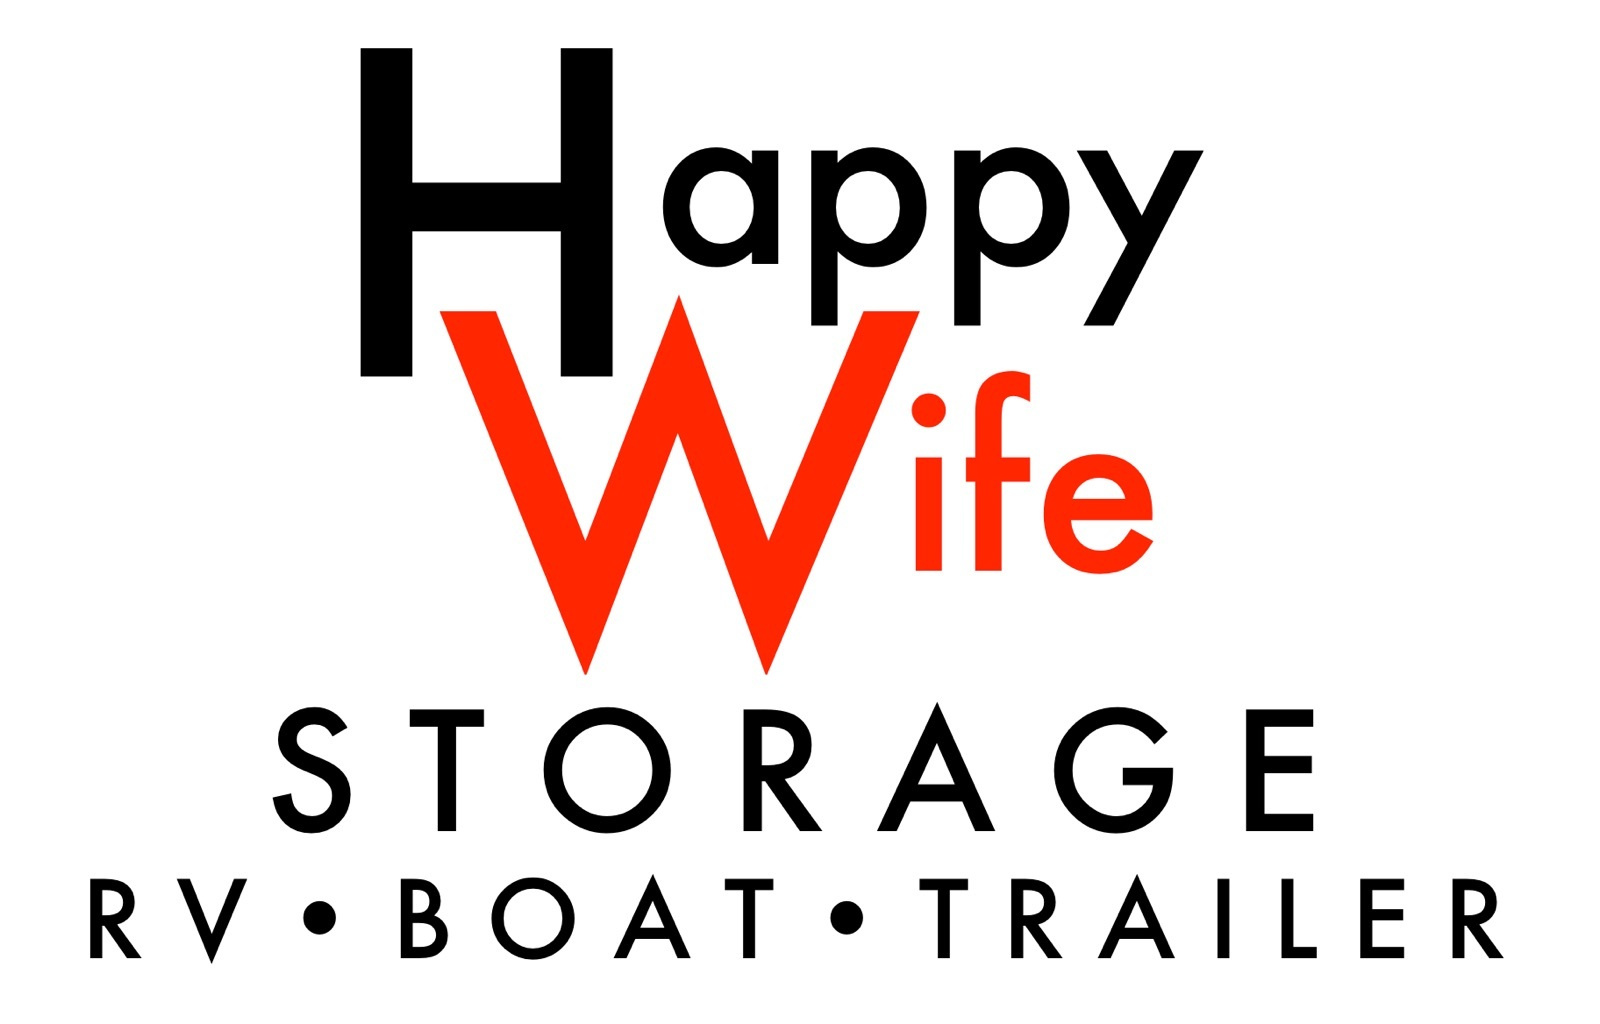 Happy Wife RV, Boat & Trailer Storage : Covered RV - Boat